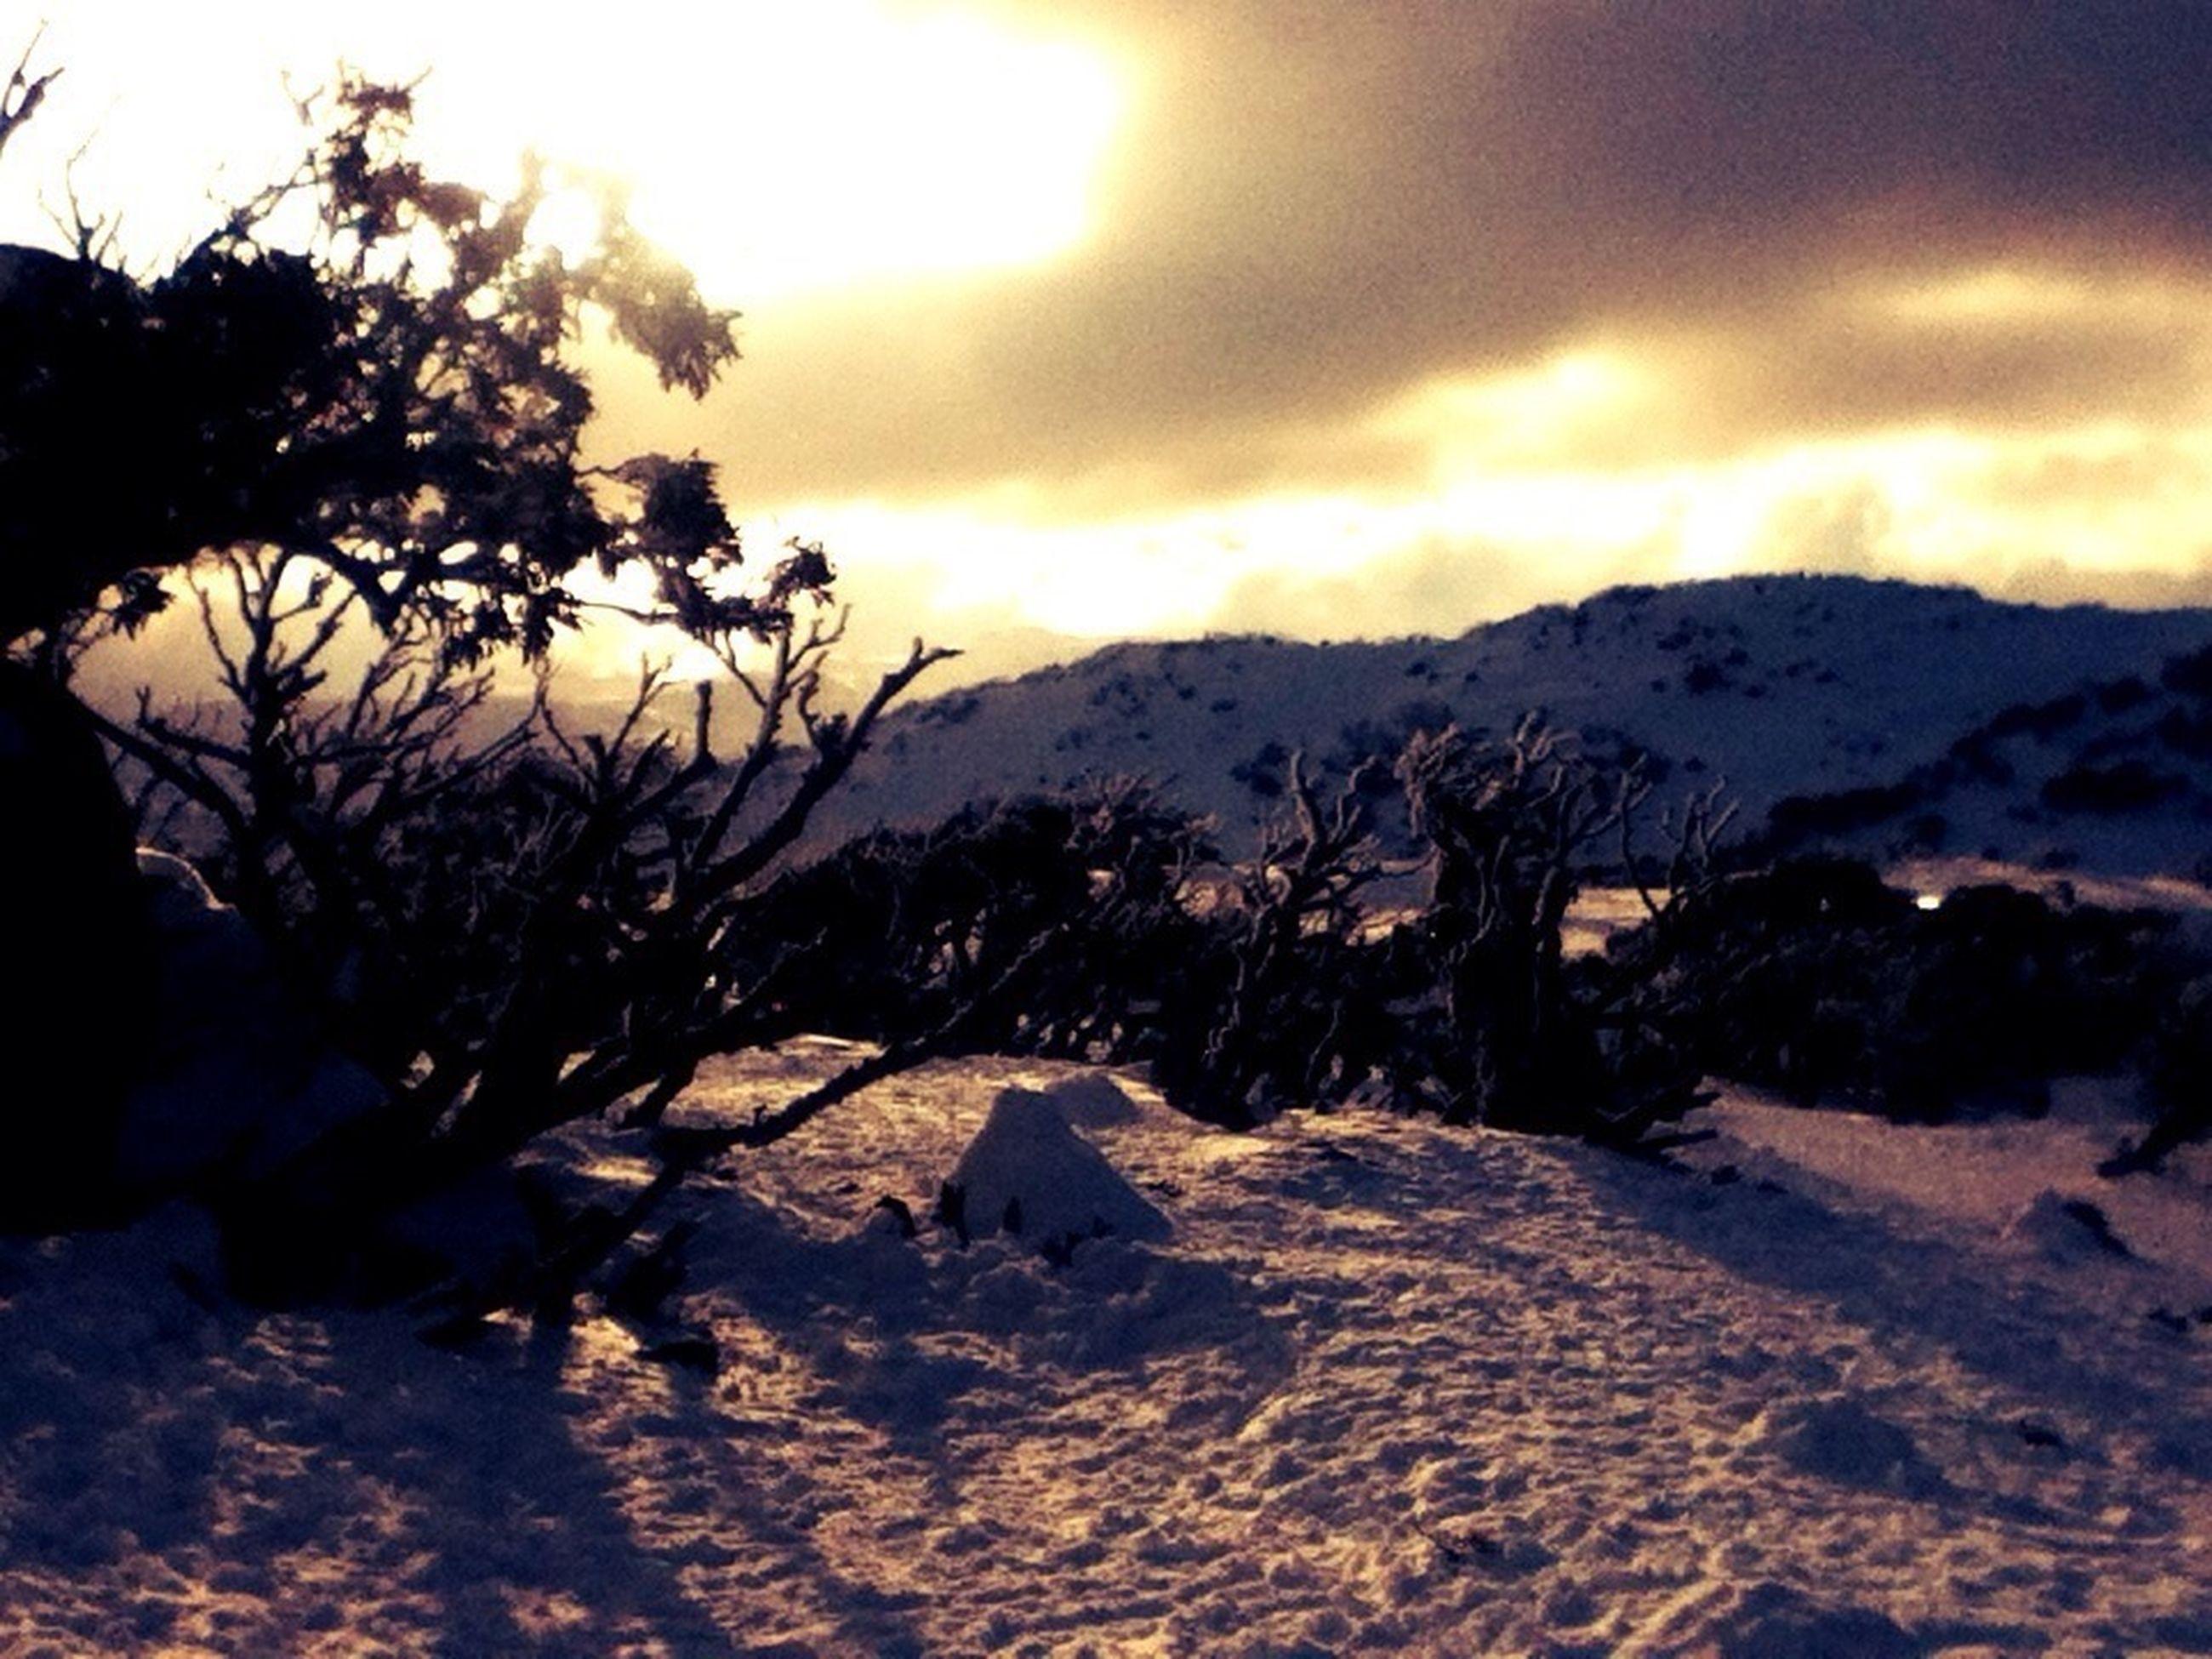 mountain, tranquil scene, sky, tranquility, scenics, beauty in nature, sunset, landscape, nature, mountain range, cloud - sky, tree, non-urban scene, sun, sunlight, idyllic, cloud, rock - object, remote, snow